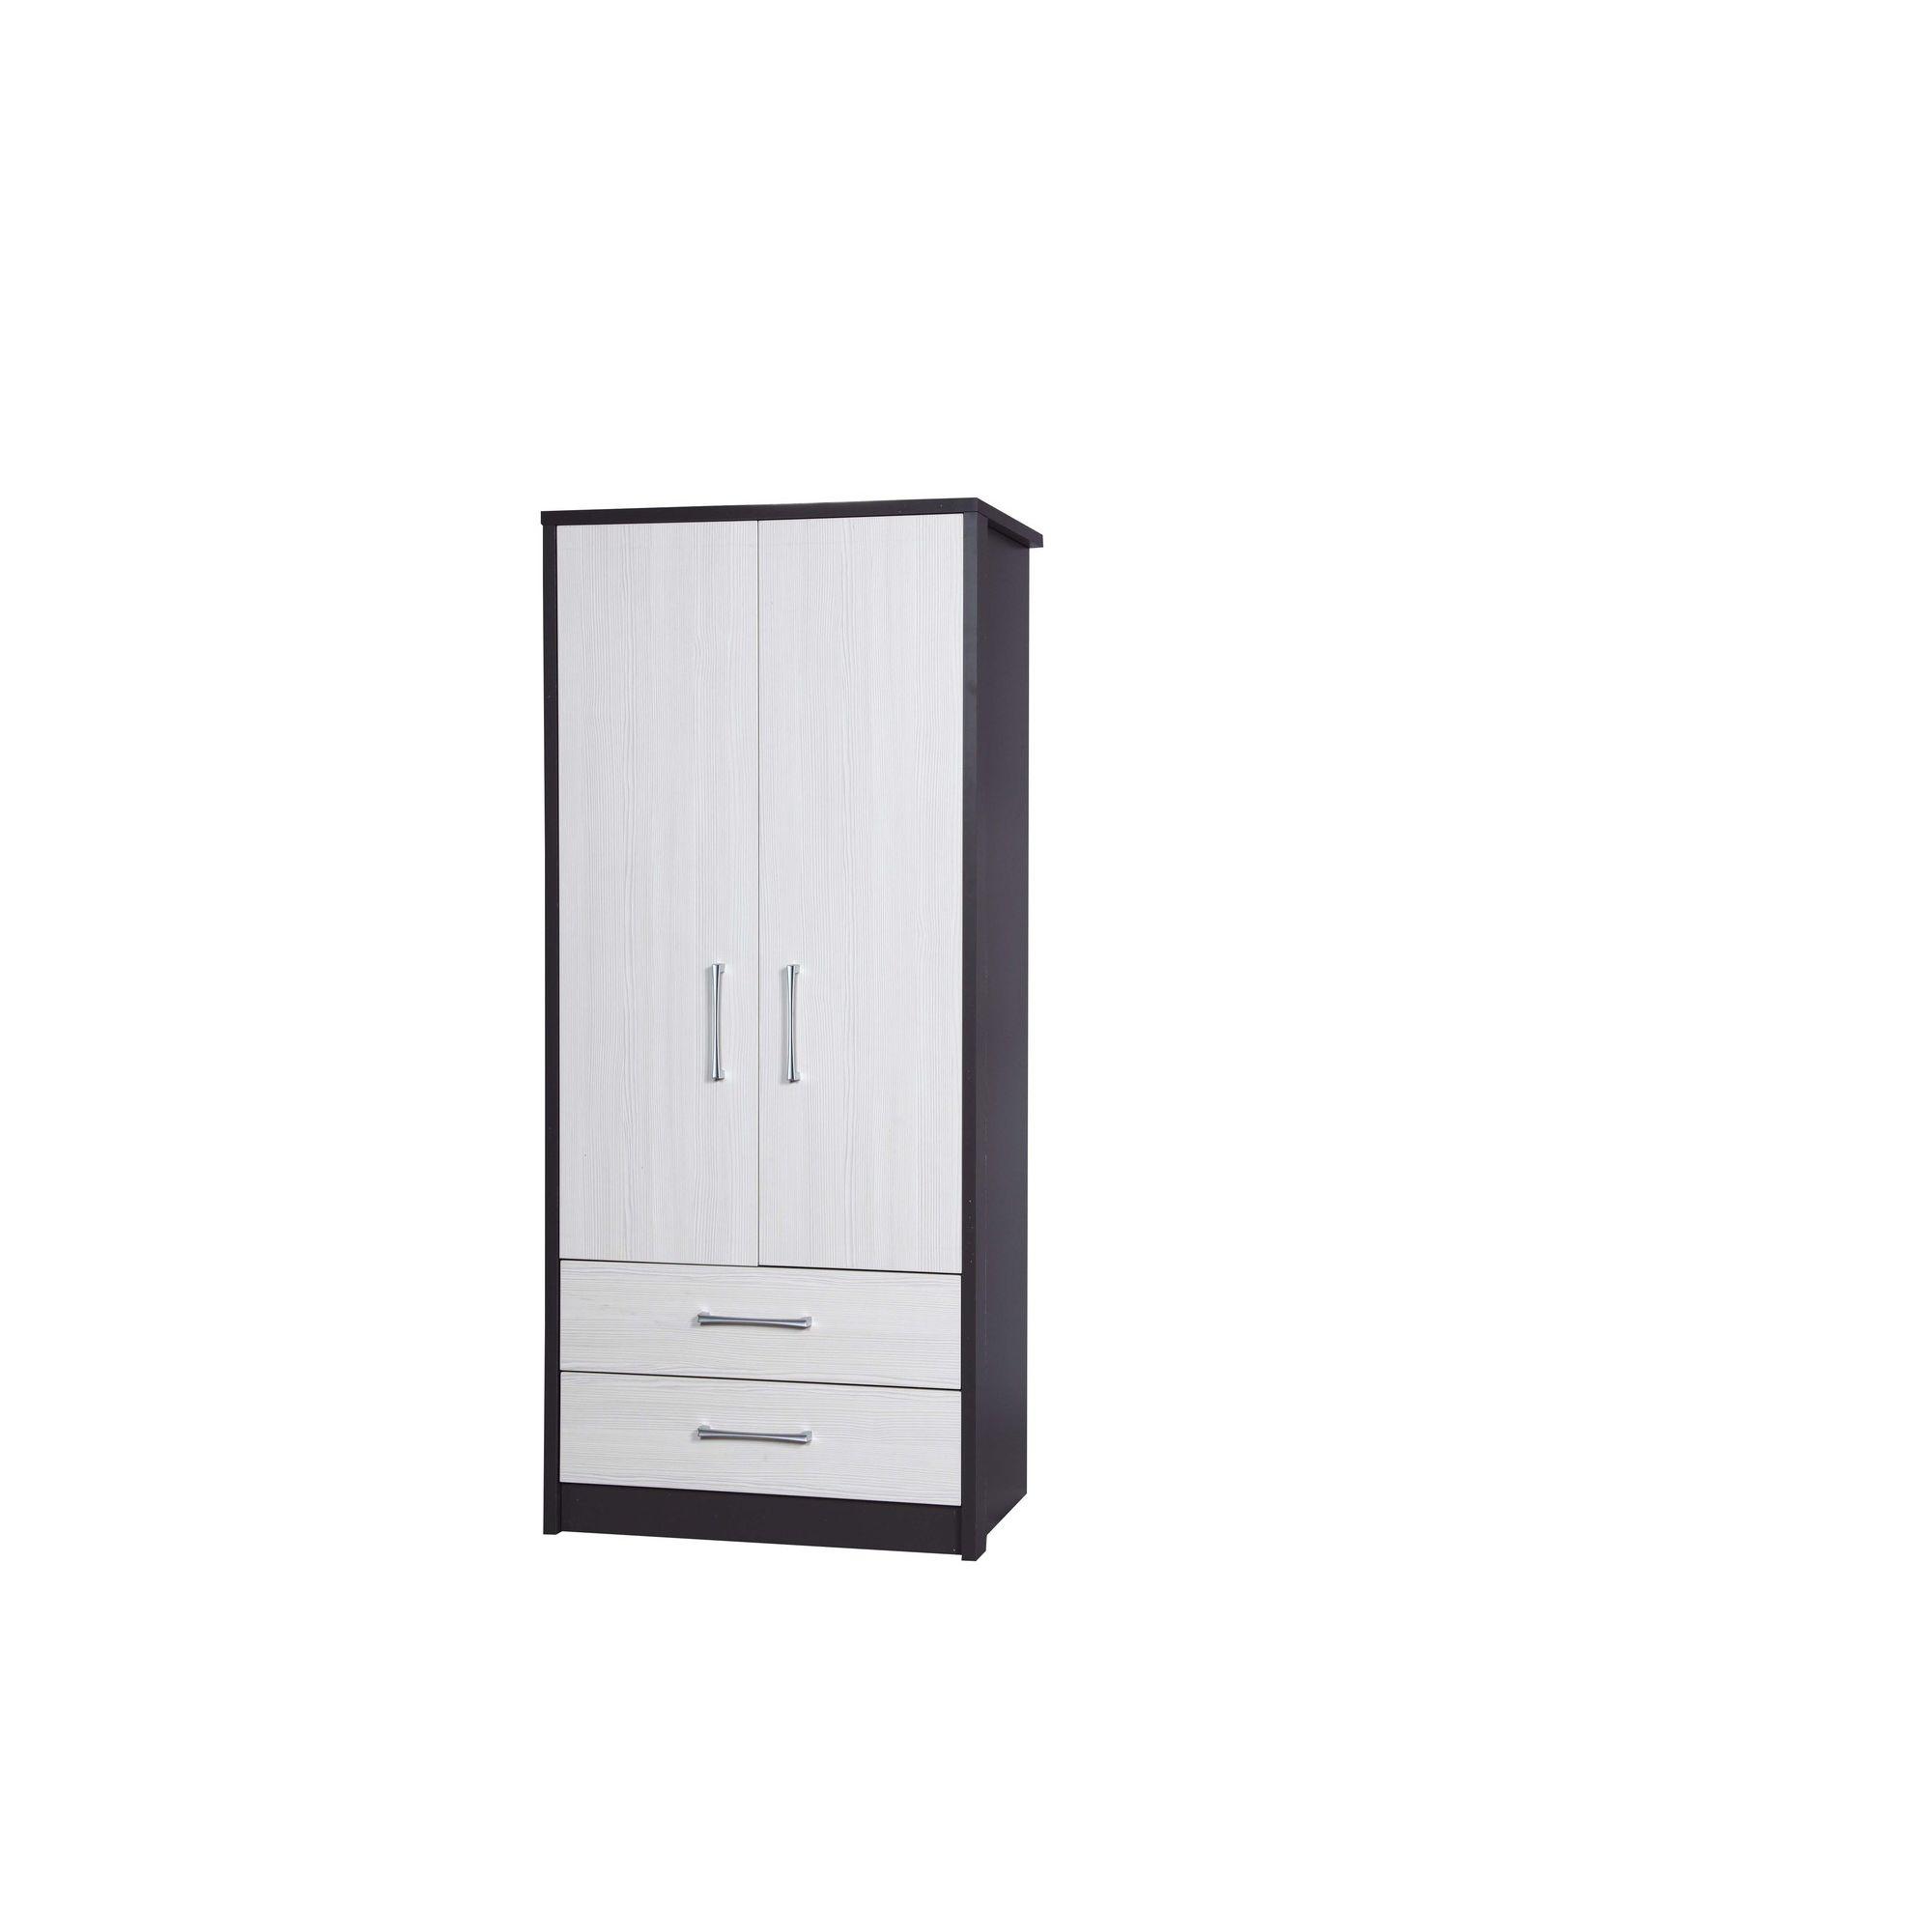 Alto Furniture Avola 2 Drawer Combi Wardrobe - Grey Carcass With White Avola at Tesco Direct